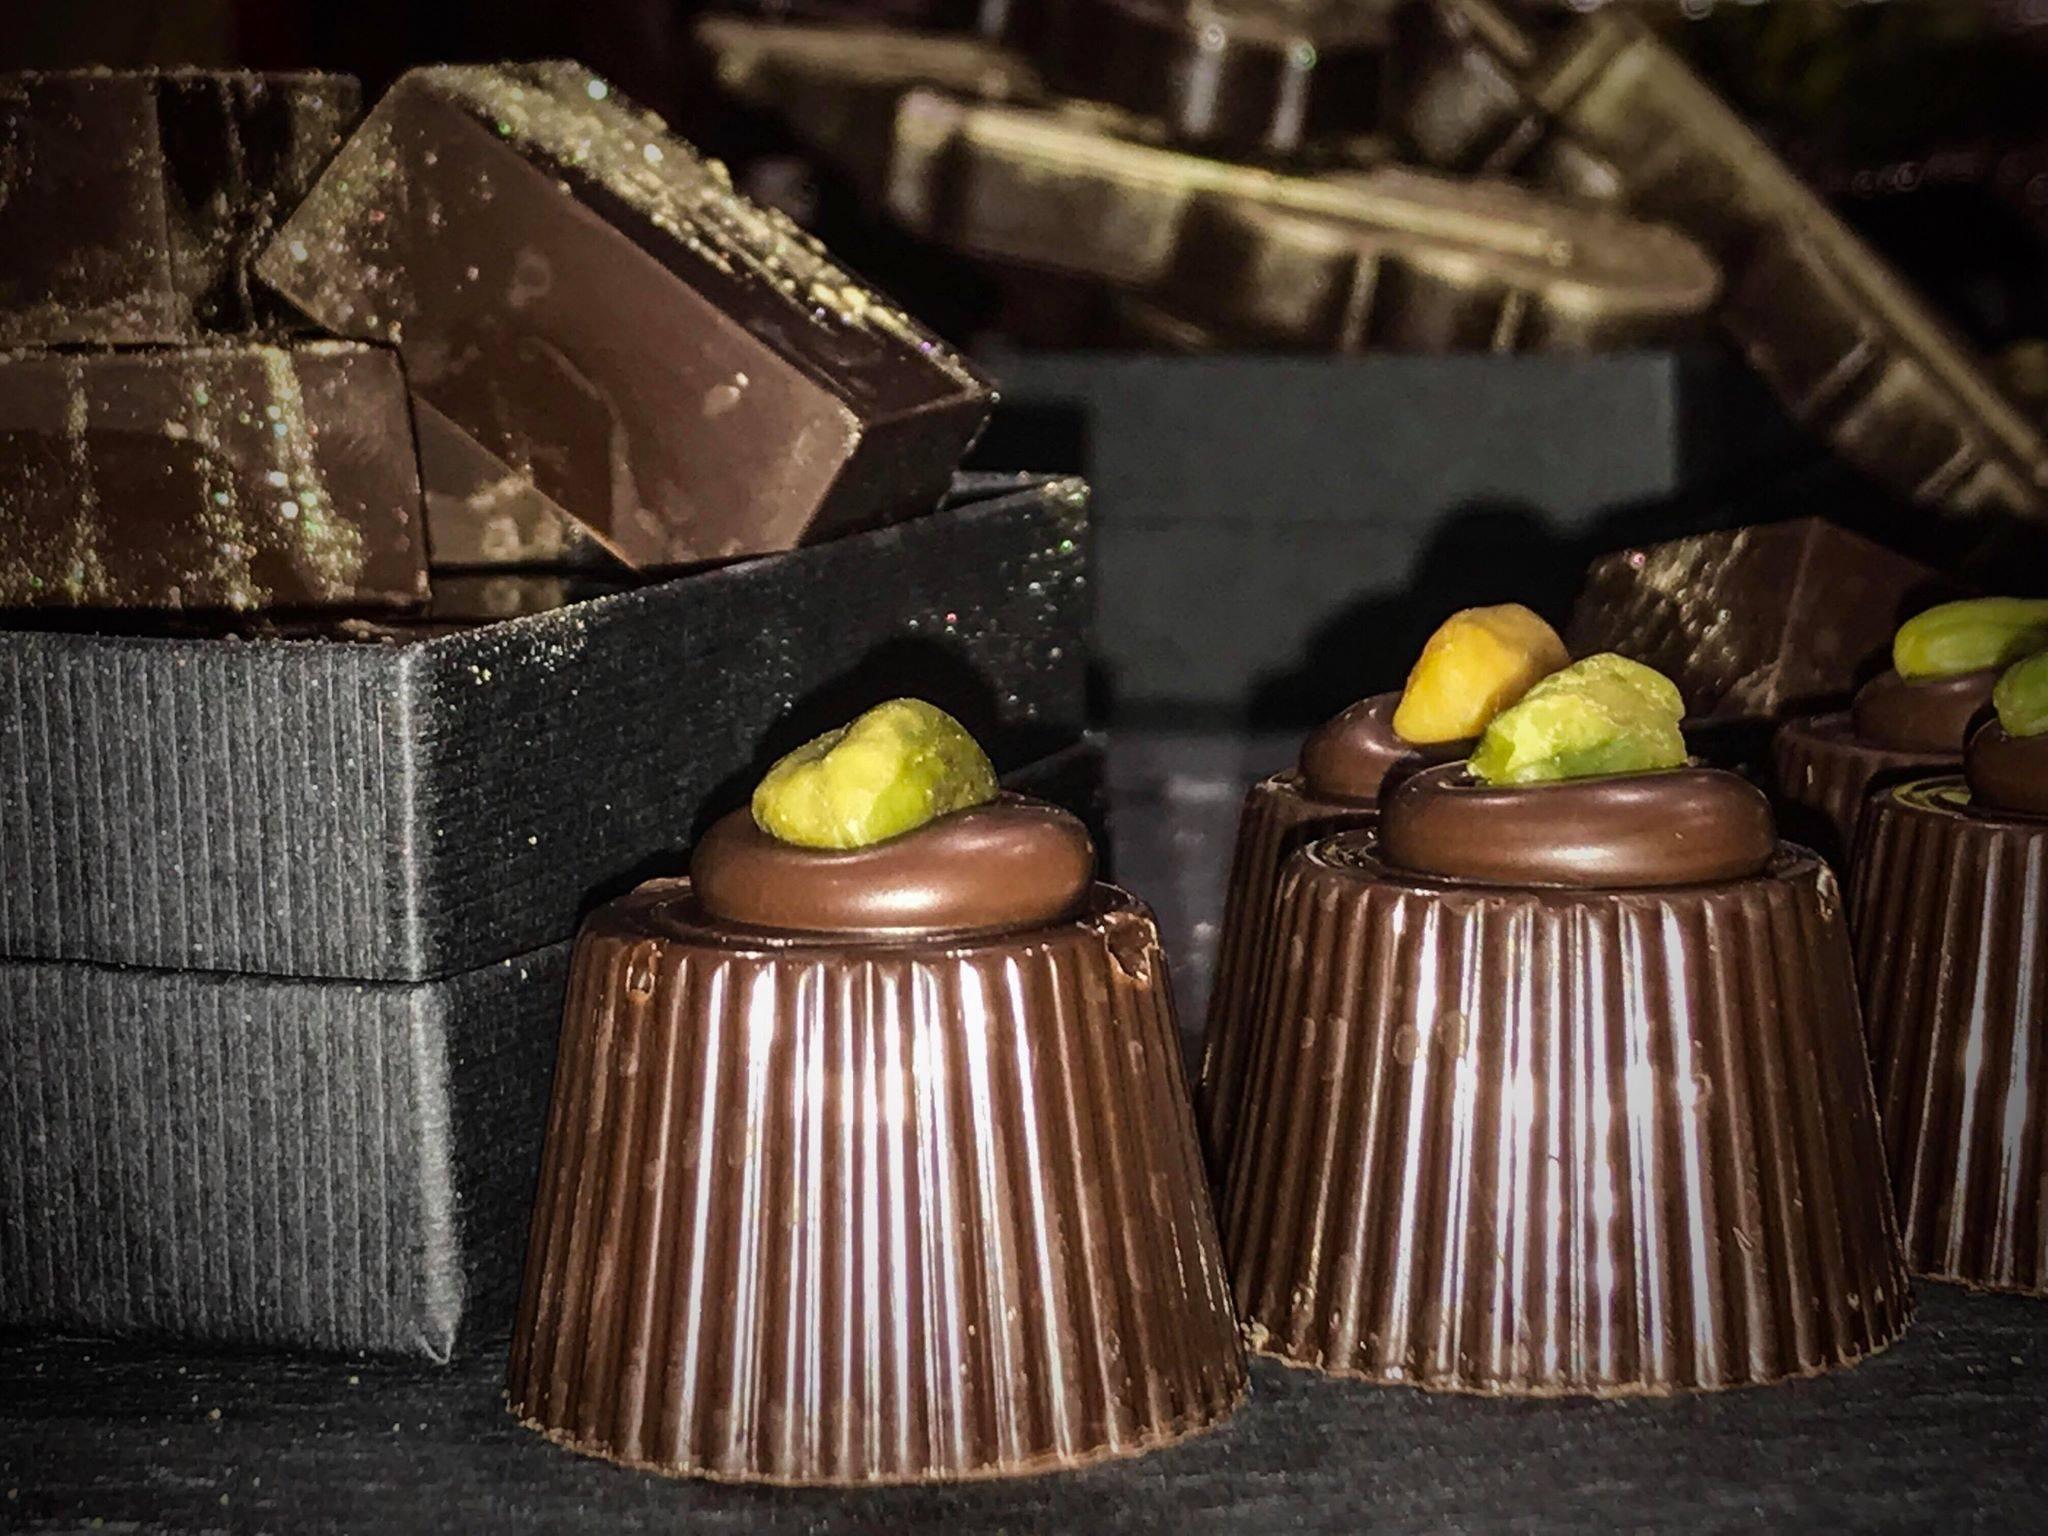 matteo_andolfo_academy_corso_sul_cioccolato_chocolateday8